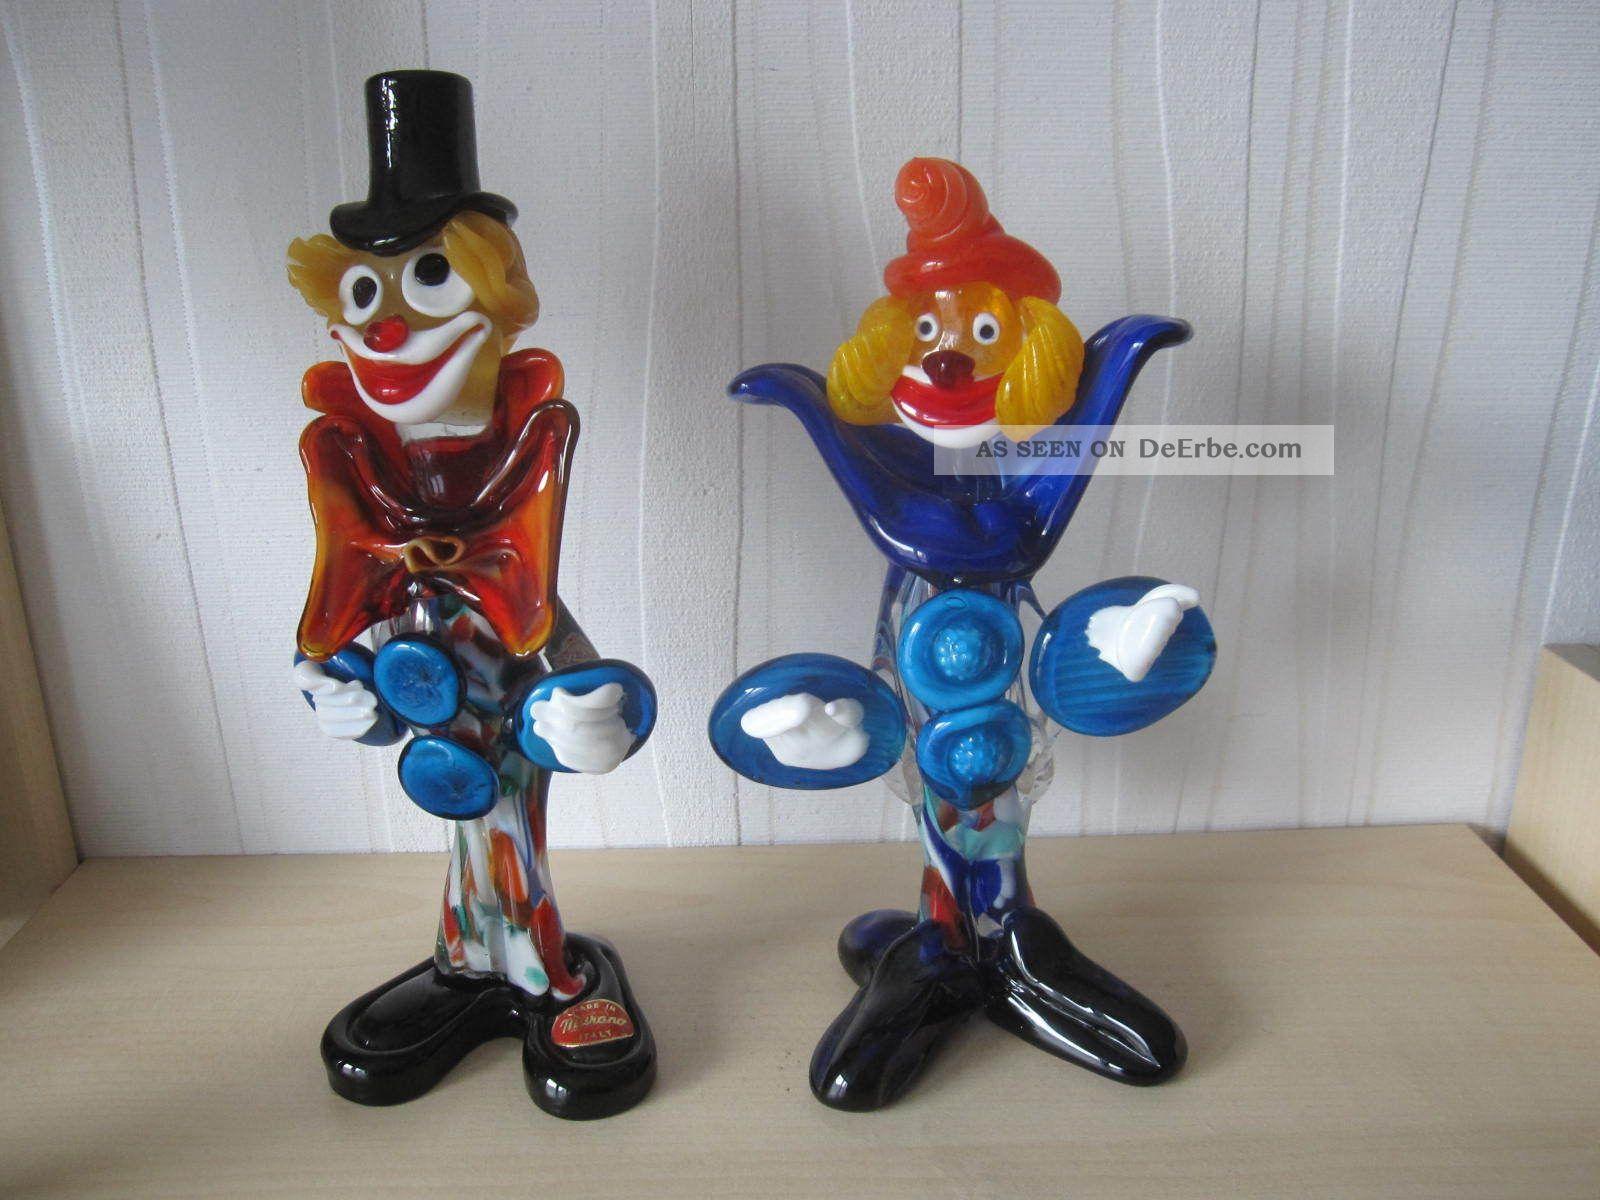 2 - Murano Clown 22,  5 U.  25 Cm.  Groß _a 3_ Glas & Kristall Bild